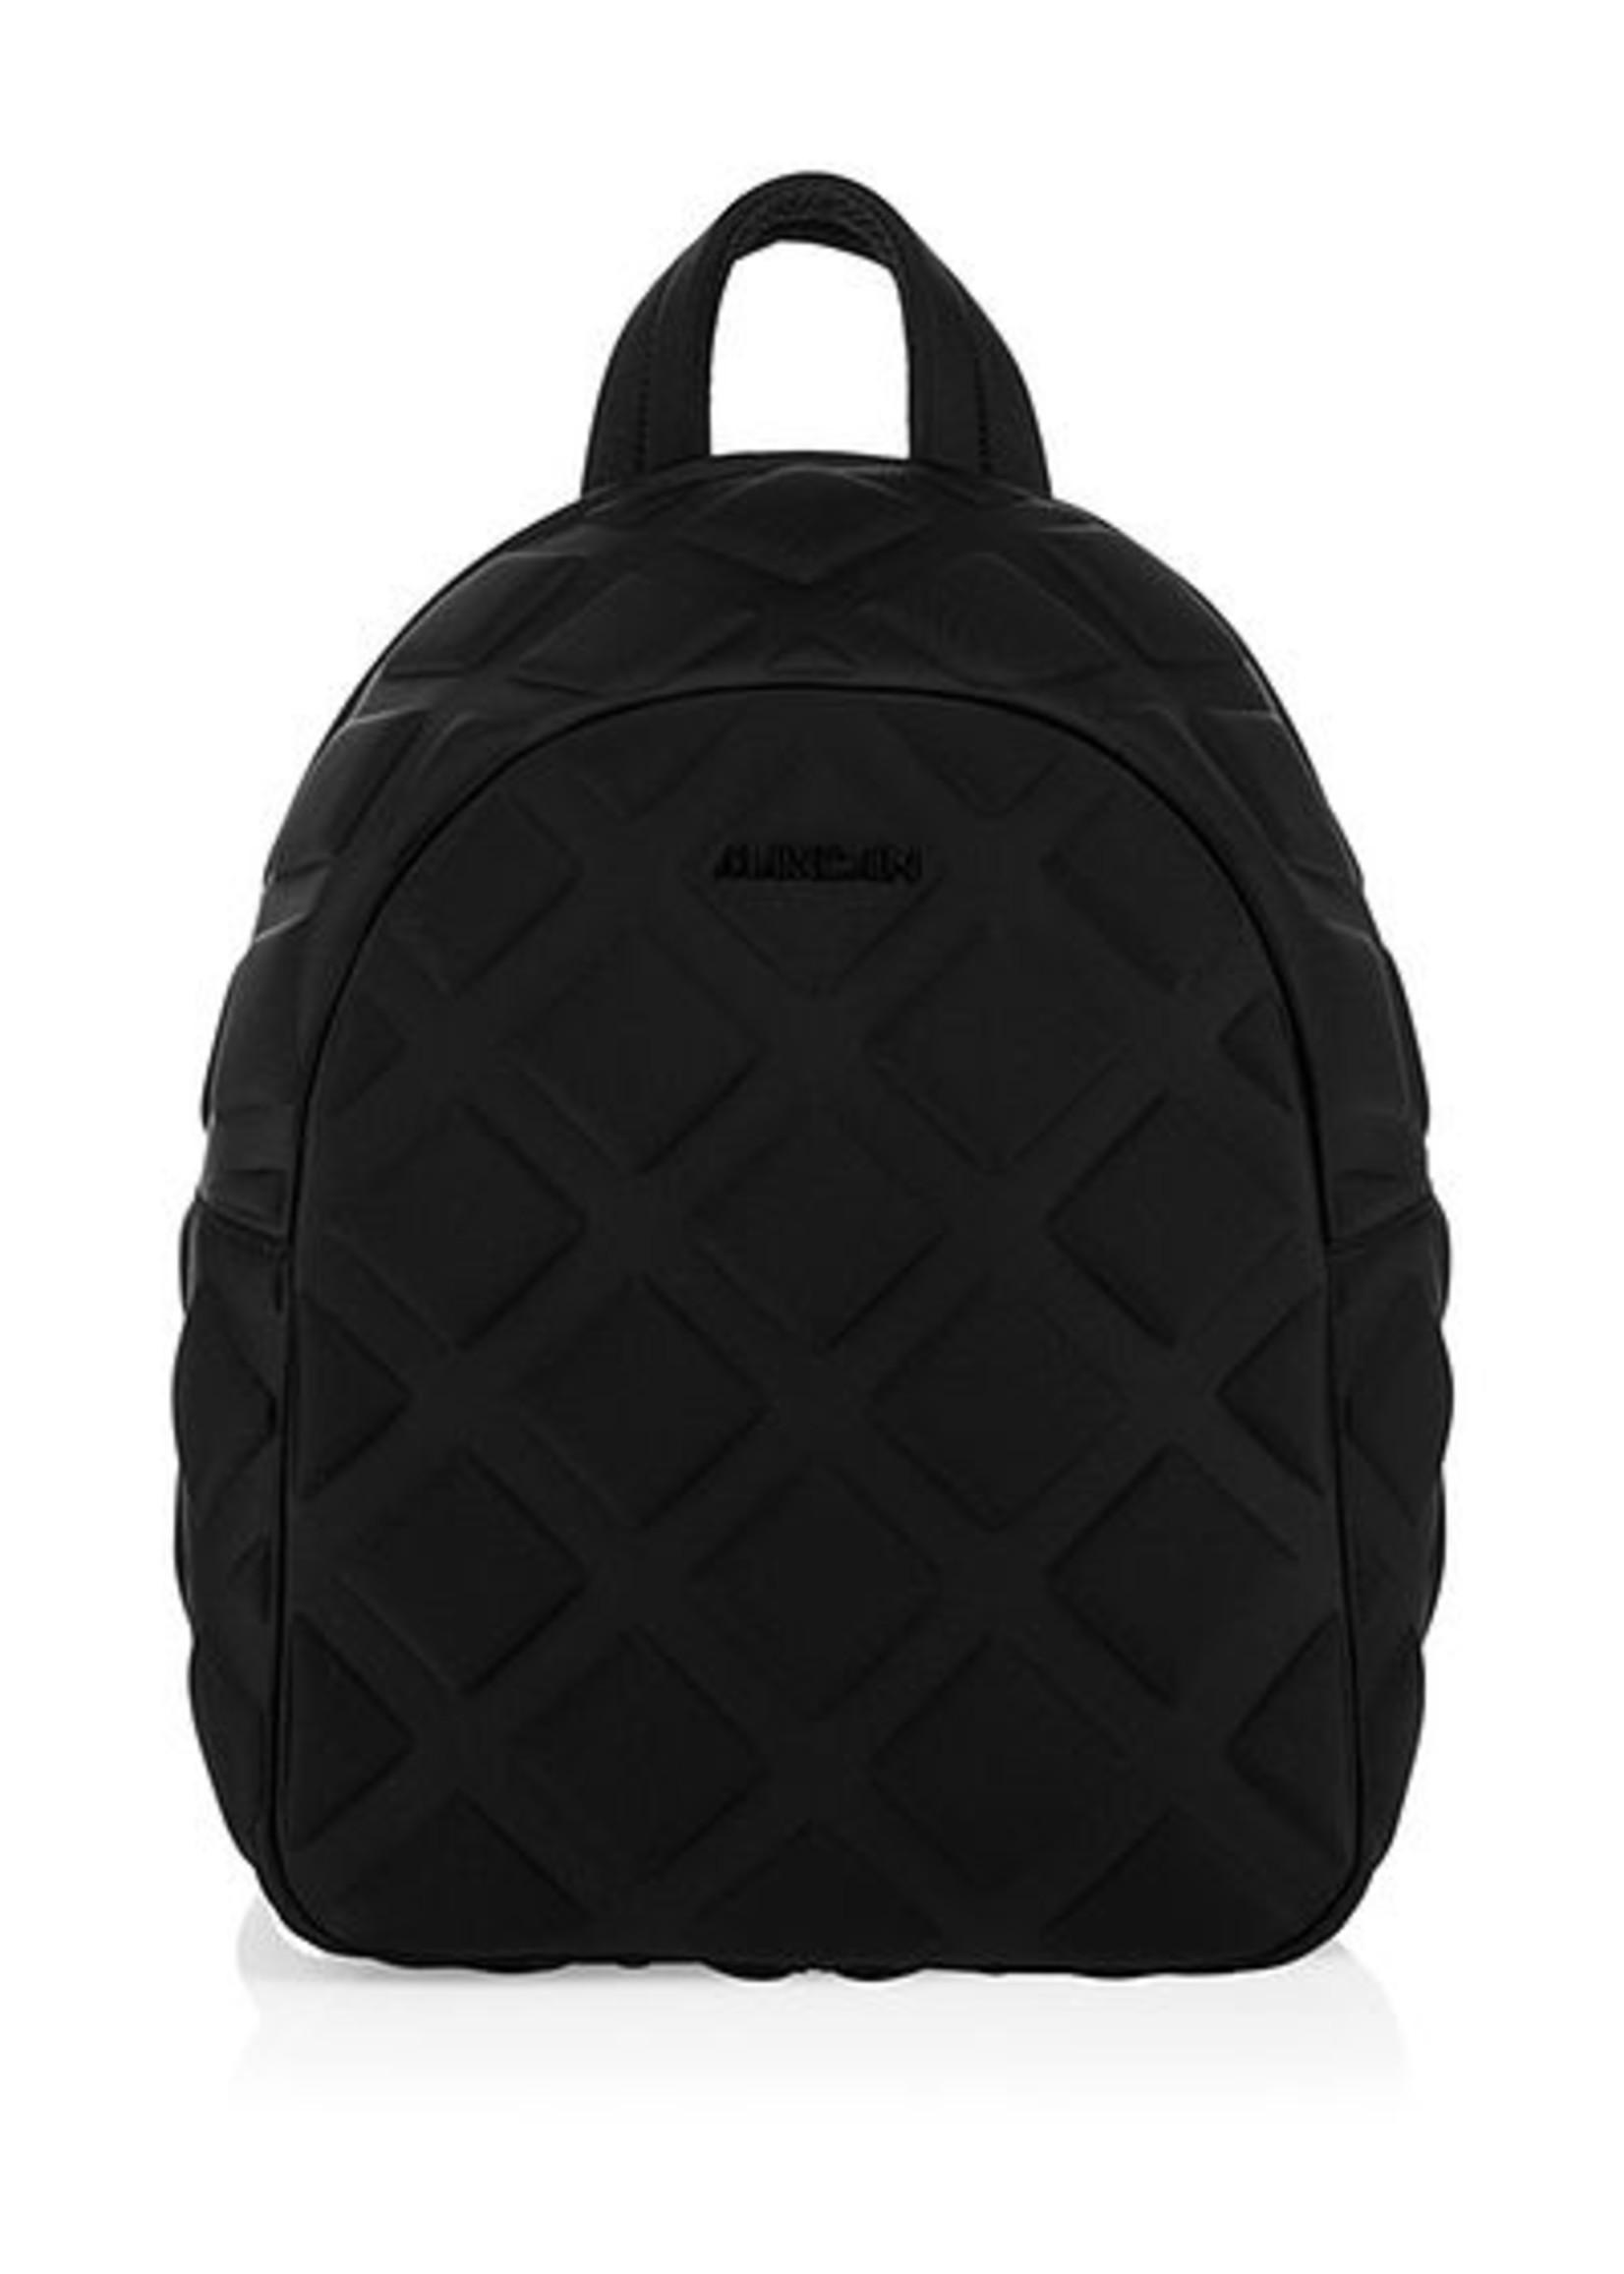 Marccain Bags & Shoes Rugzak RB T5.02 J05 black